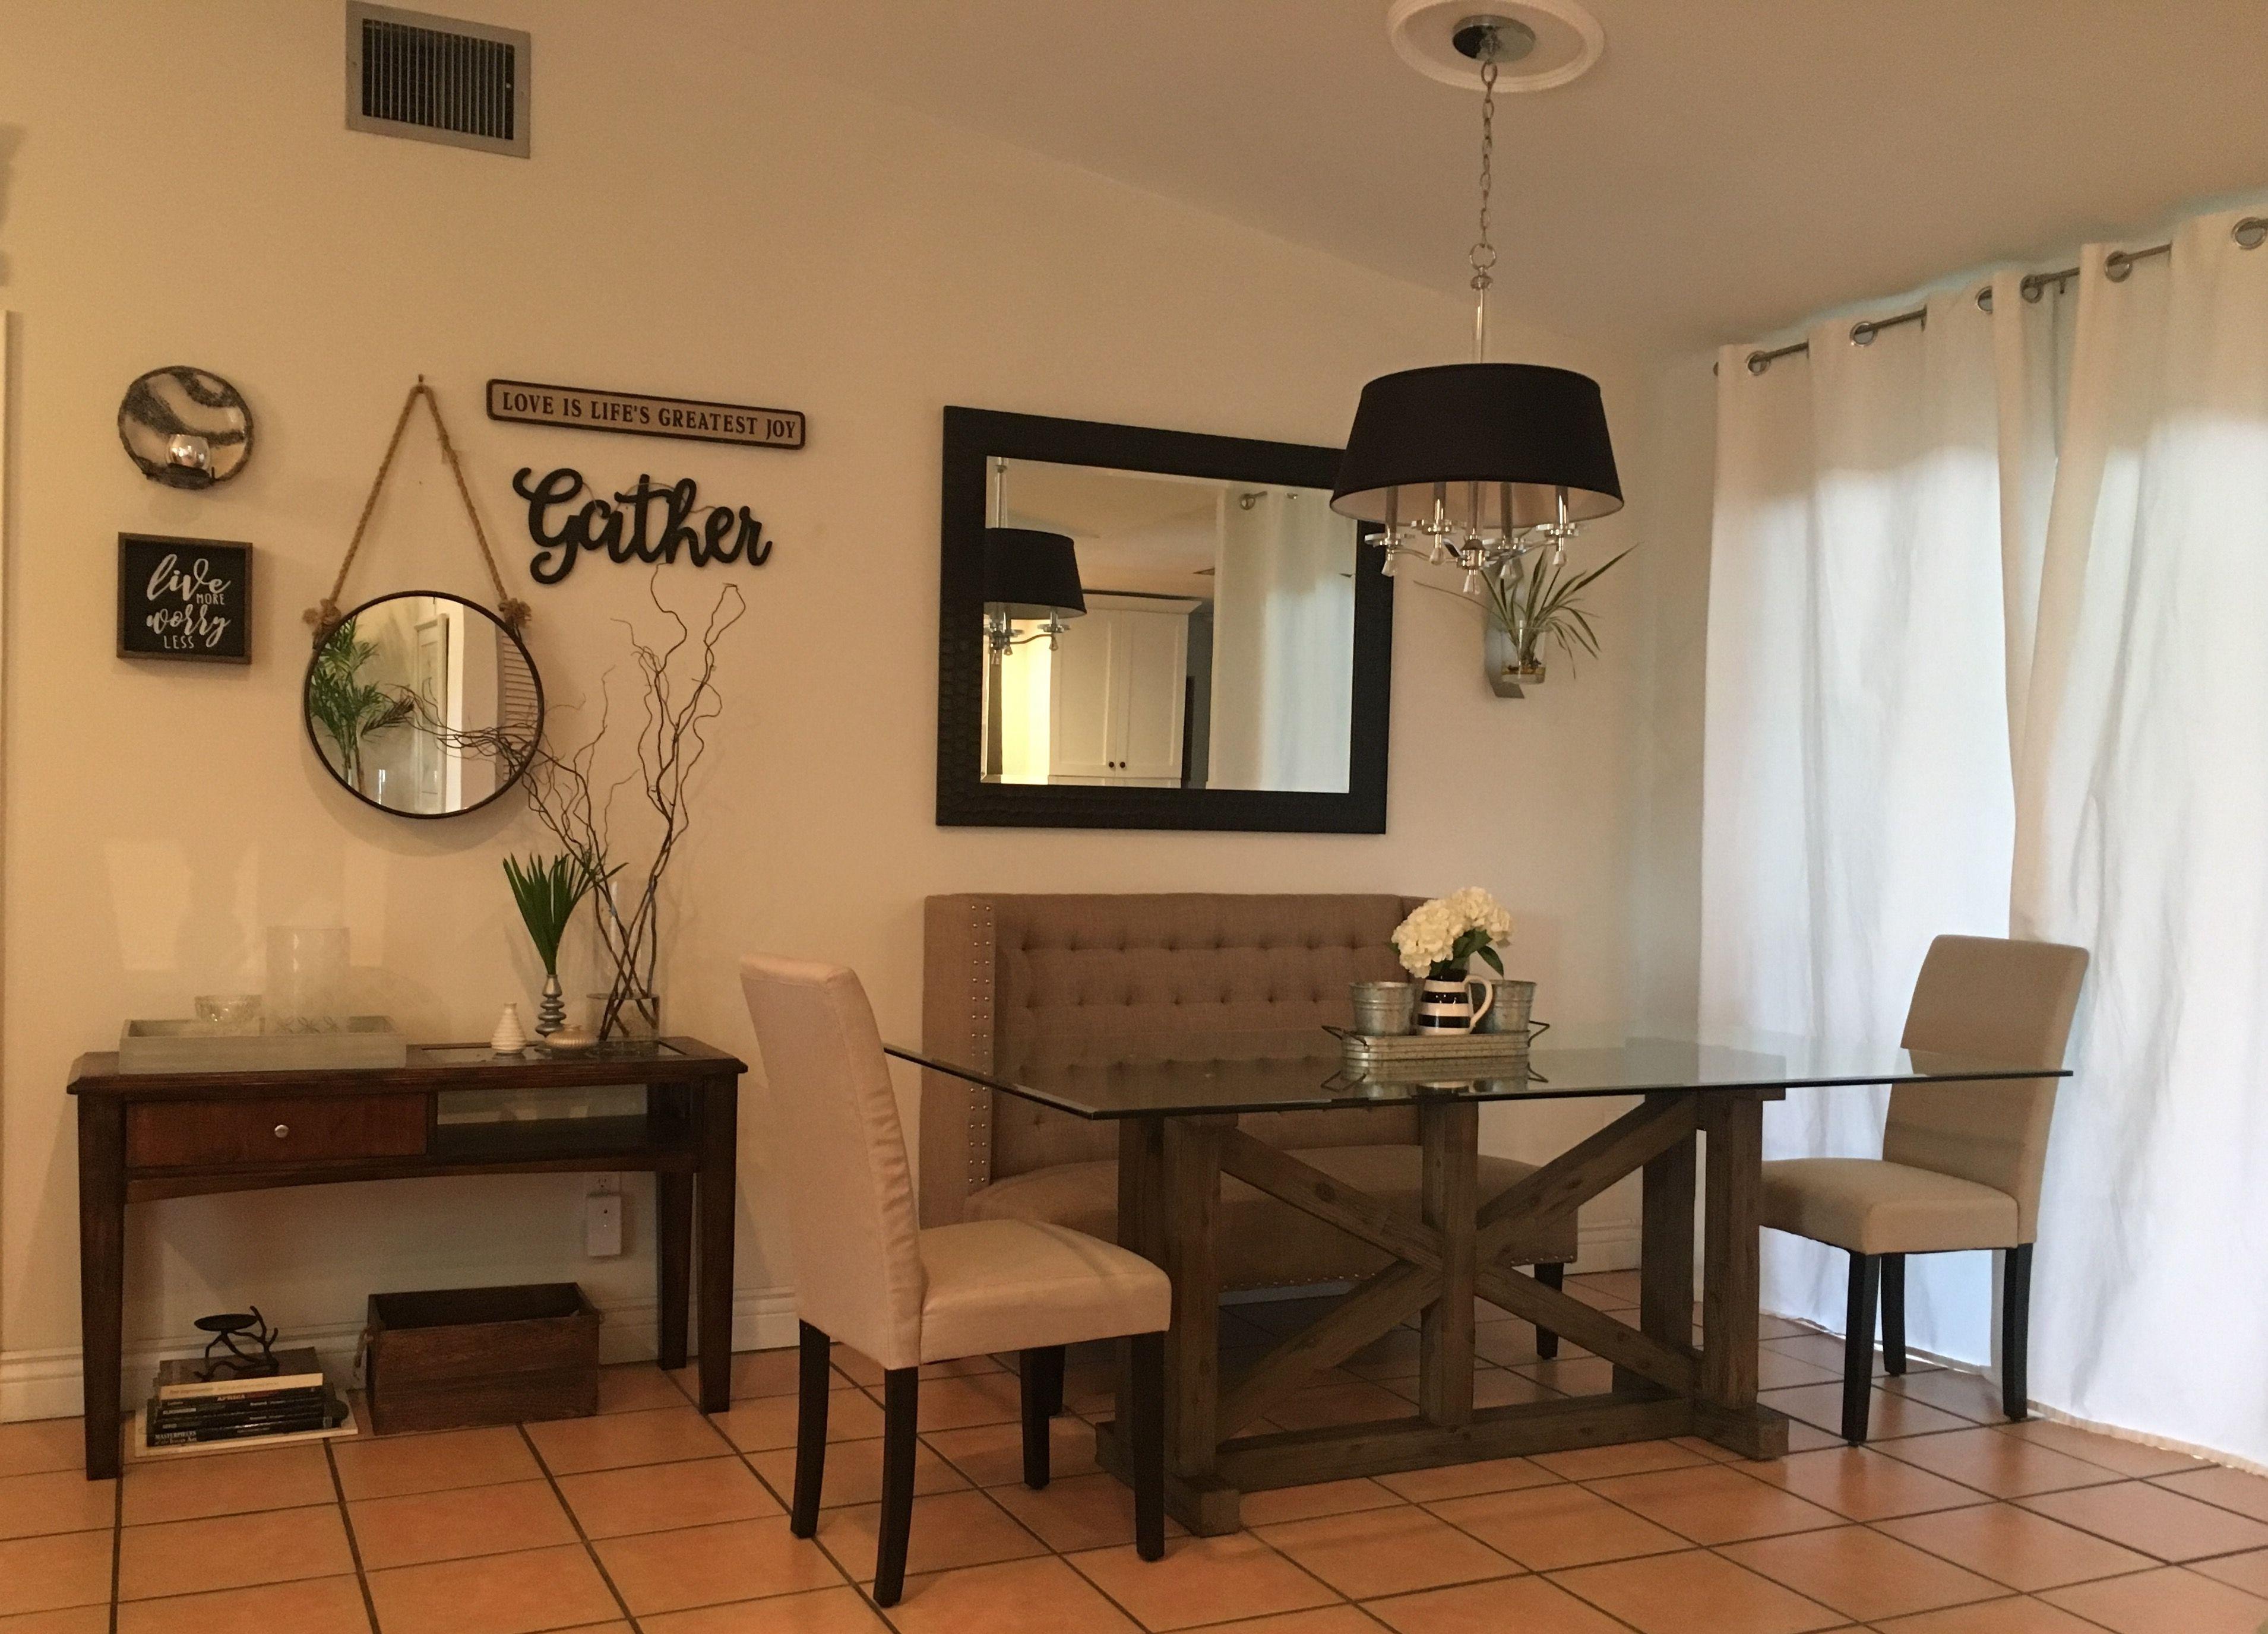 Rustic modern farmhouse cozy dining decor eclectic contemporary